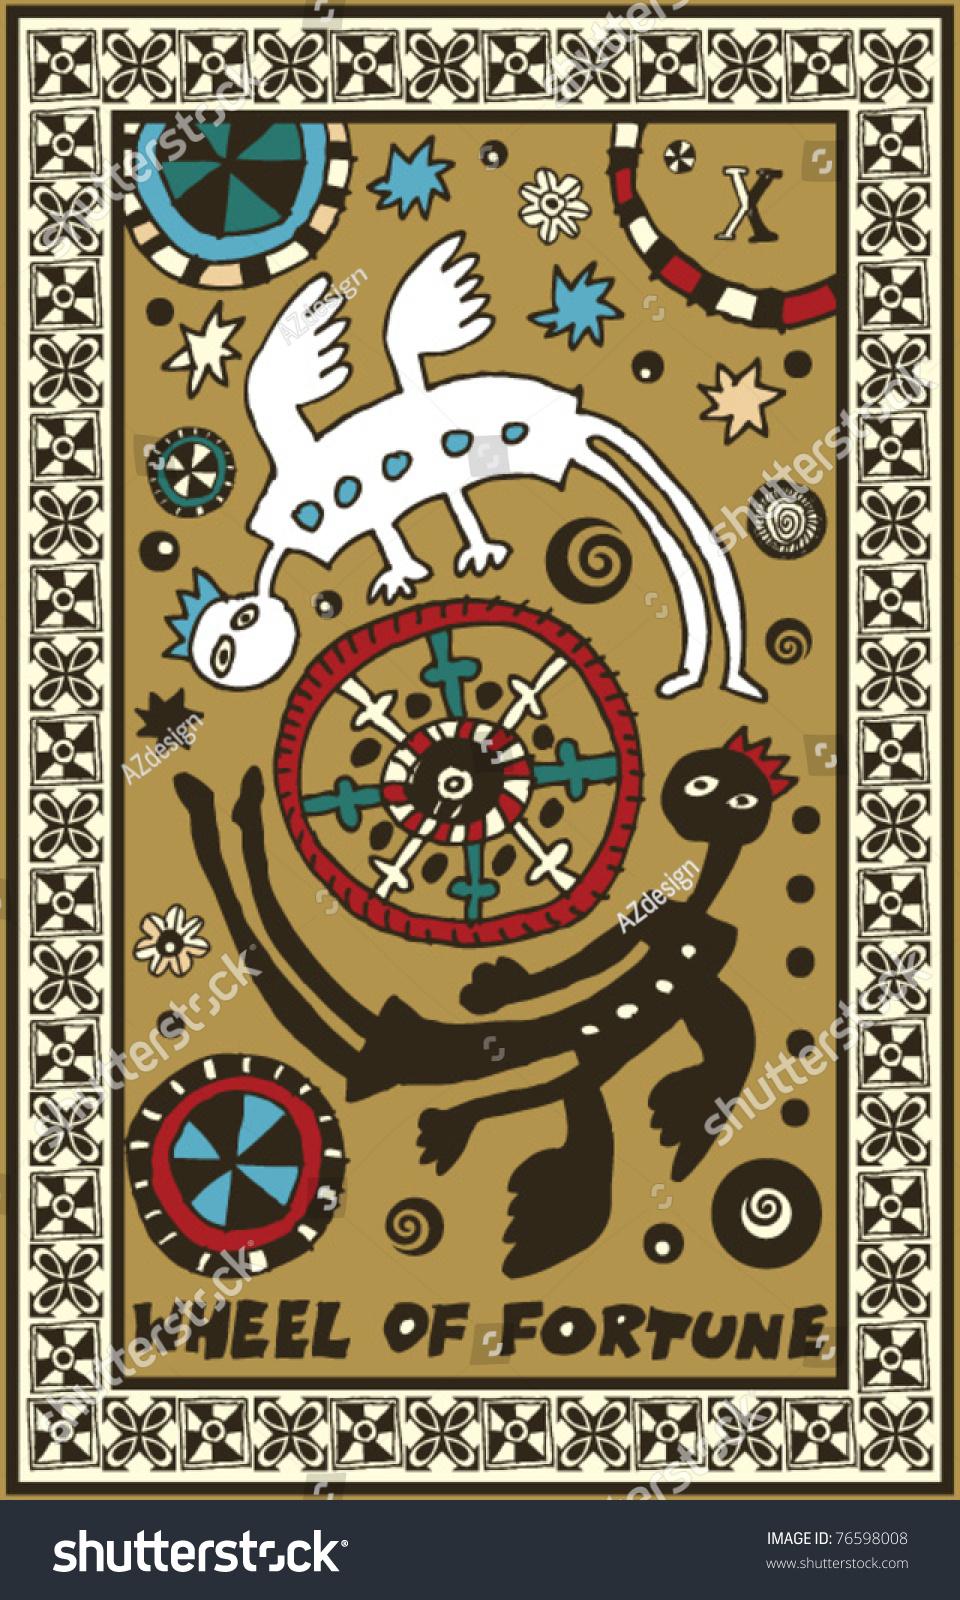 Thoth Fortune Tarot Card Tutorial: Hand Drawn Tarot Deck, Major Arcana, The Wheel Of Fortune